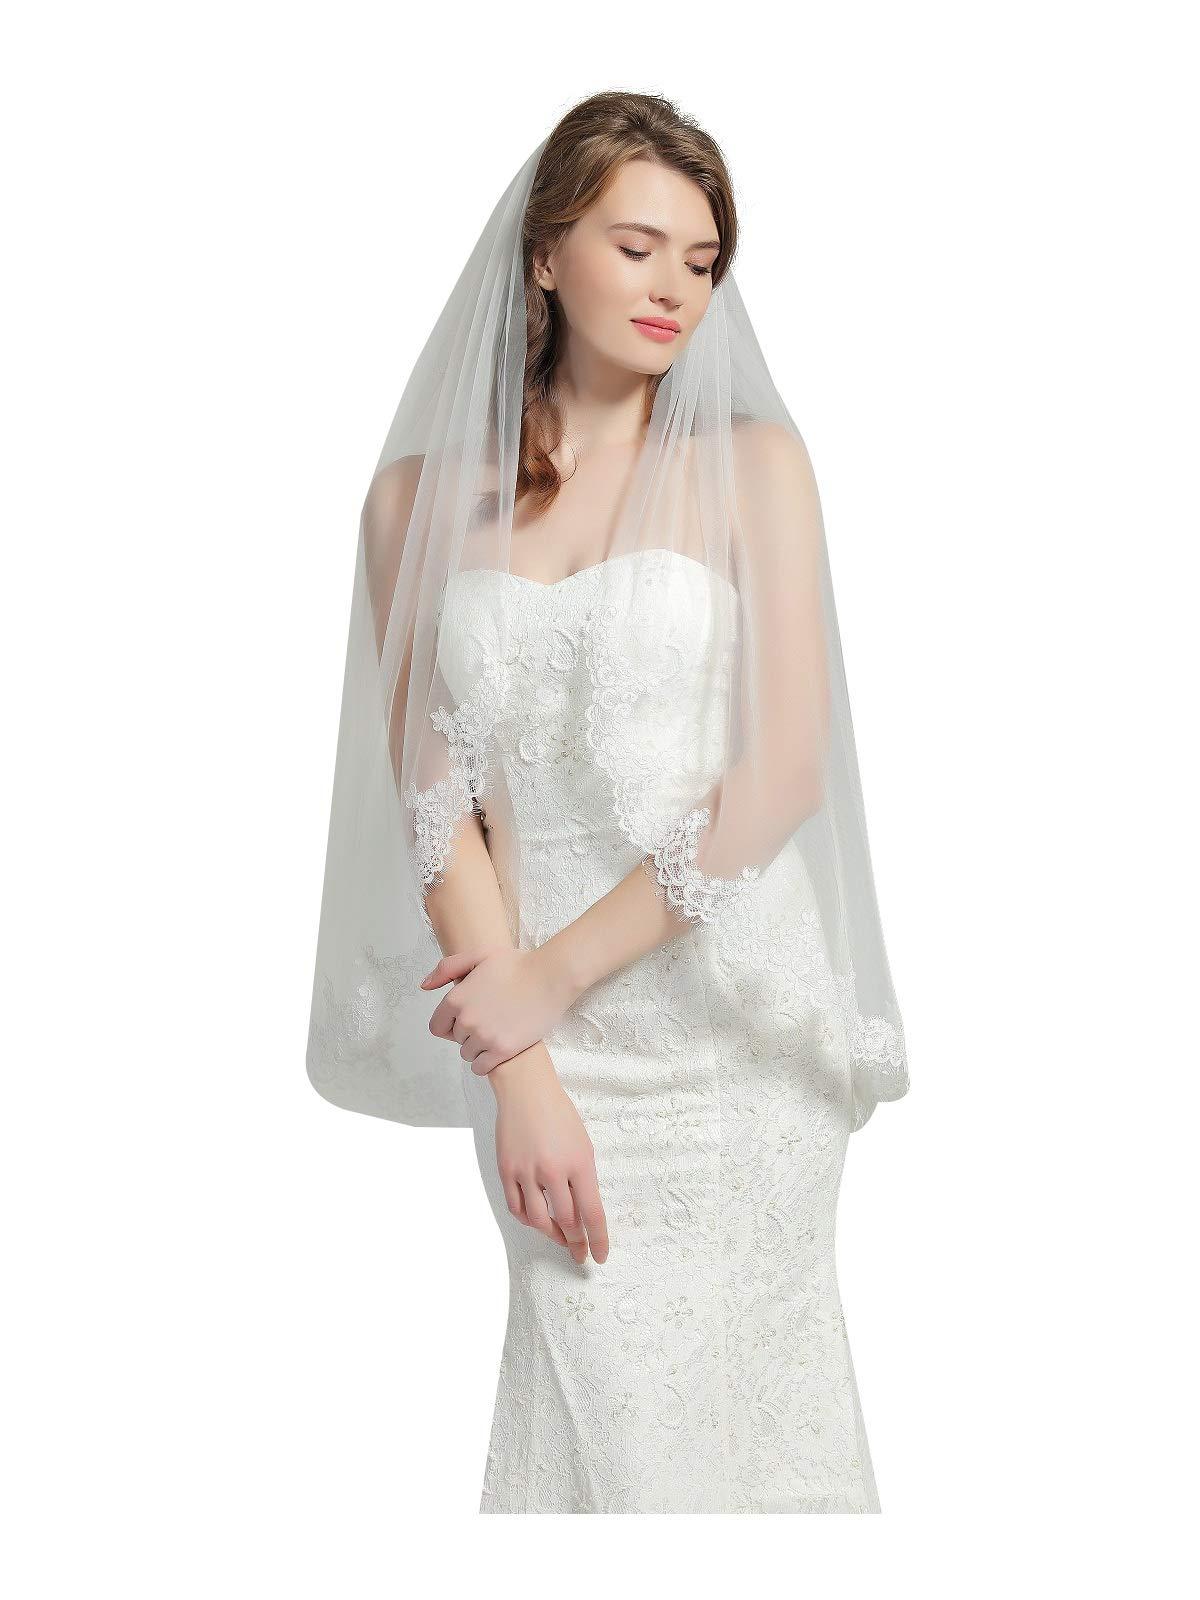 Wedding Bridal Veil with Comb 1 Tier Eyelash Lace Trim Applique Edge Fingertip Length 37'' V80-Ivory by BEAUTELICATE